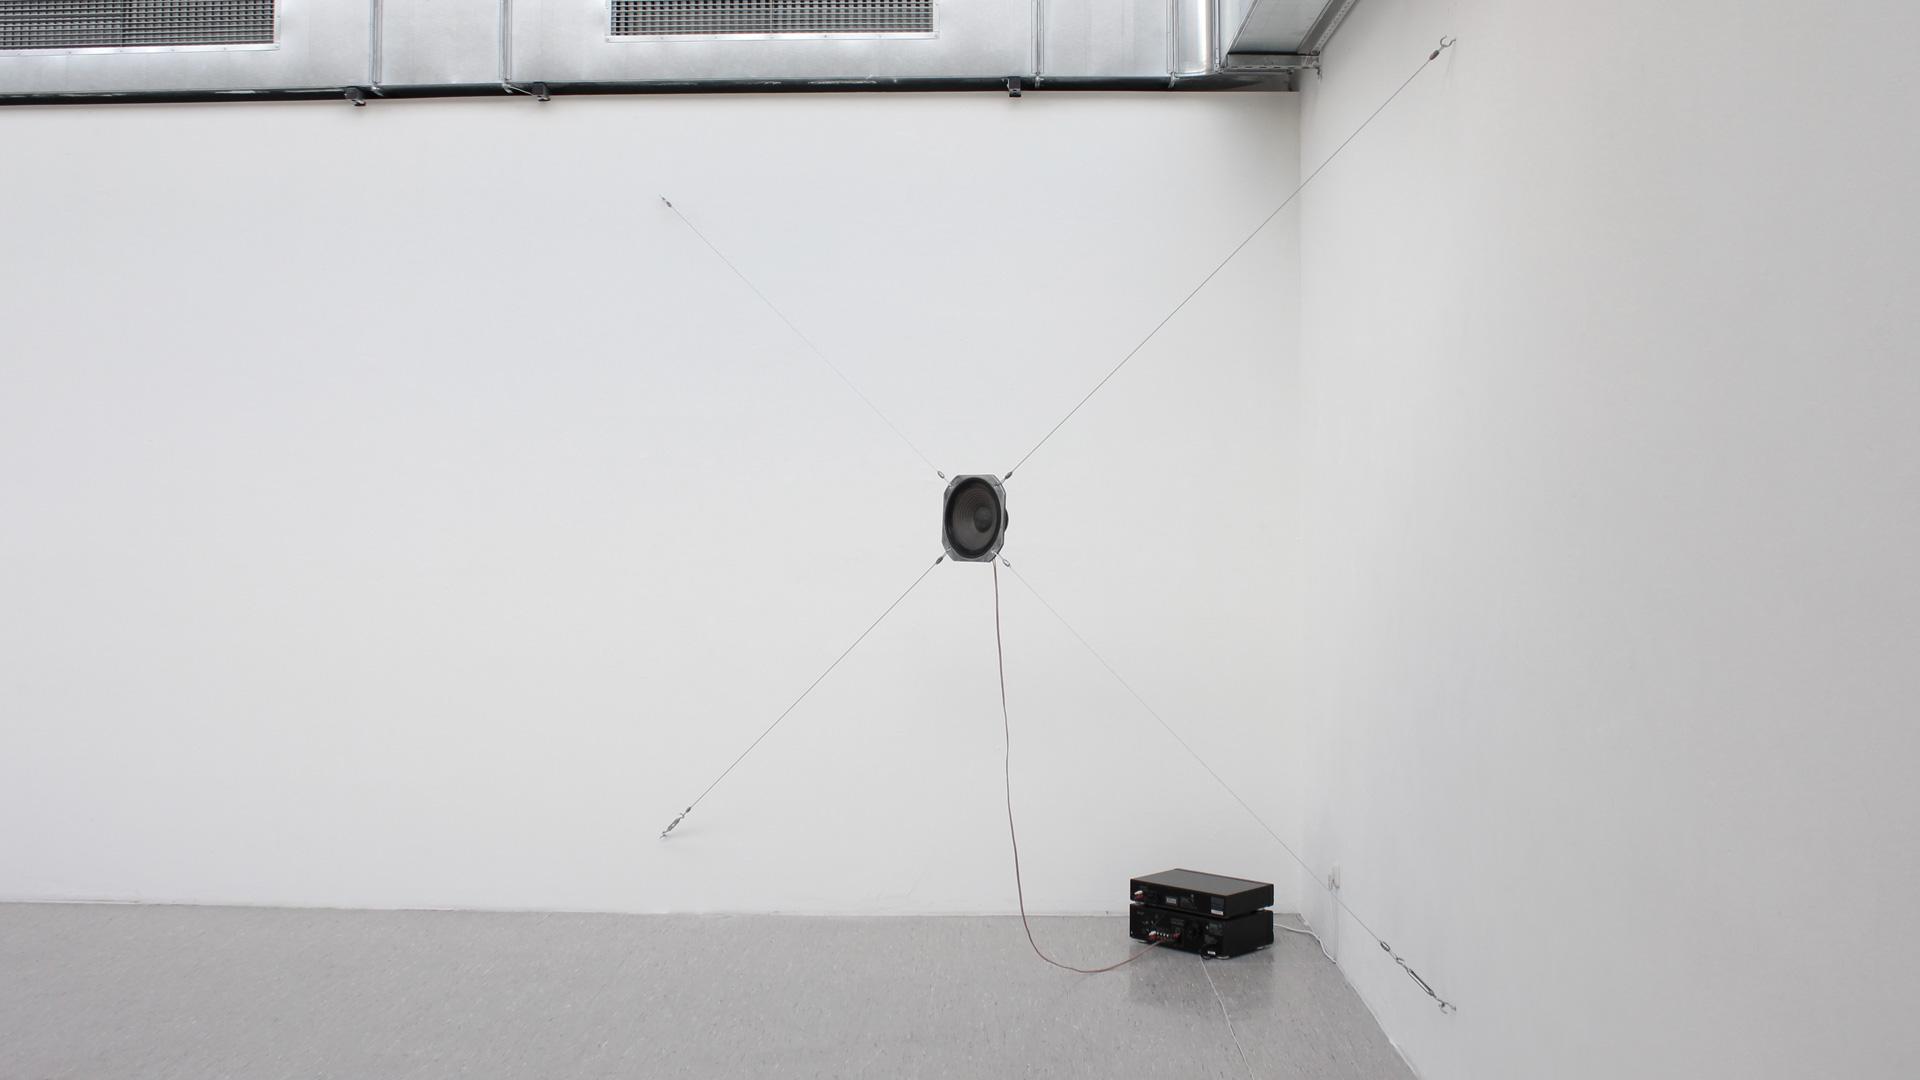 Charmant Drahtseilspuler Galerie - Der Schaltplan - greigo.com